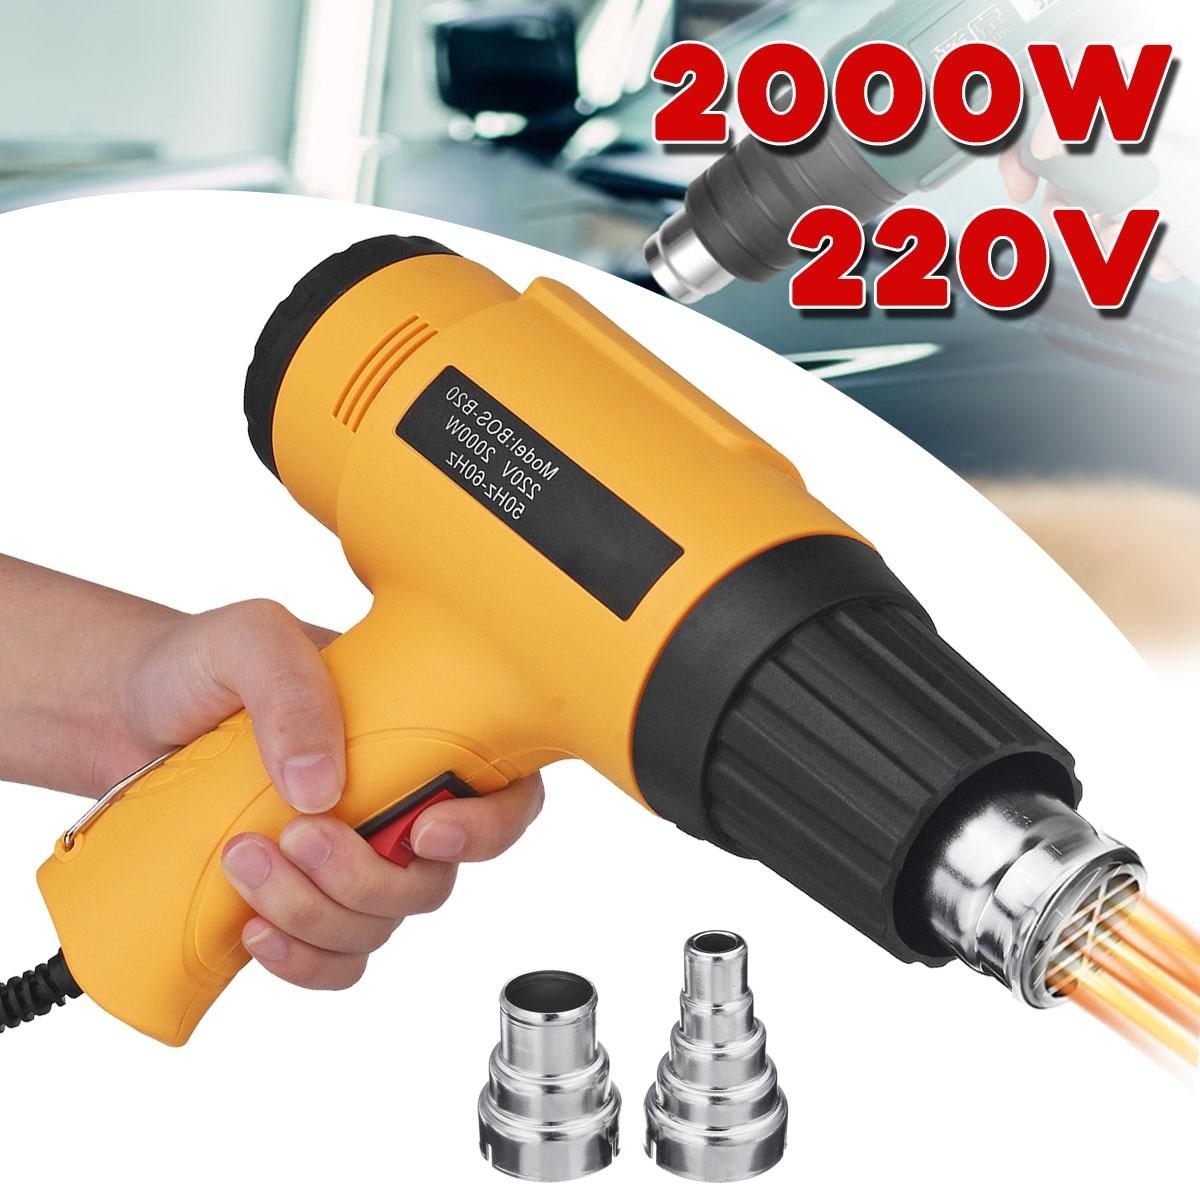 Becornce 2000W 220V Industrial Adjustable Temperature Hot Air-Gun Blower Heat-Gun W/3 5 Nozzles New 2 Colors Power Tools